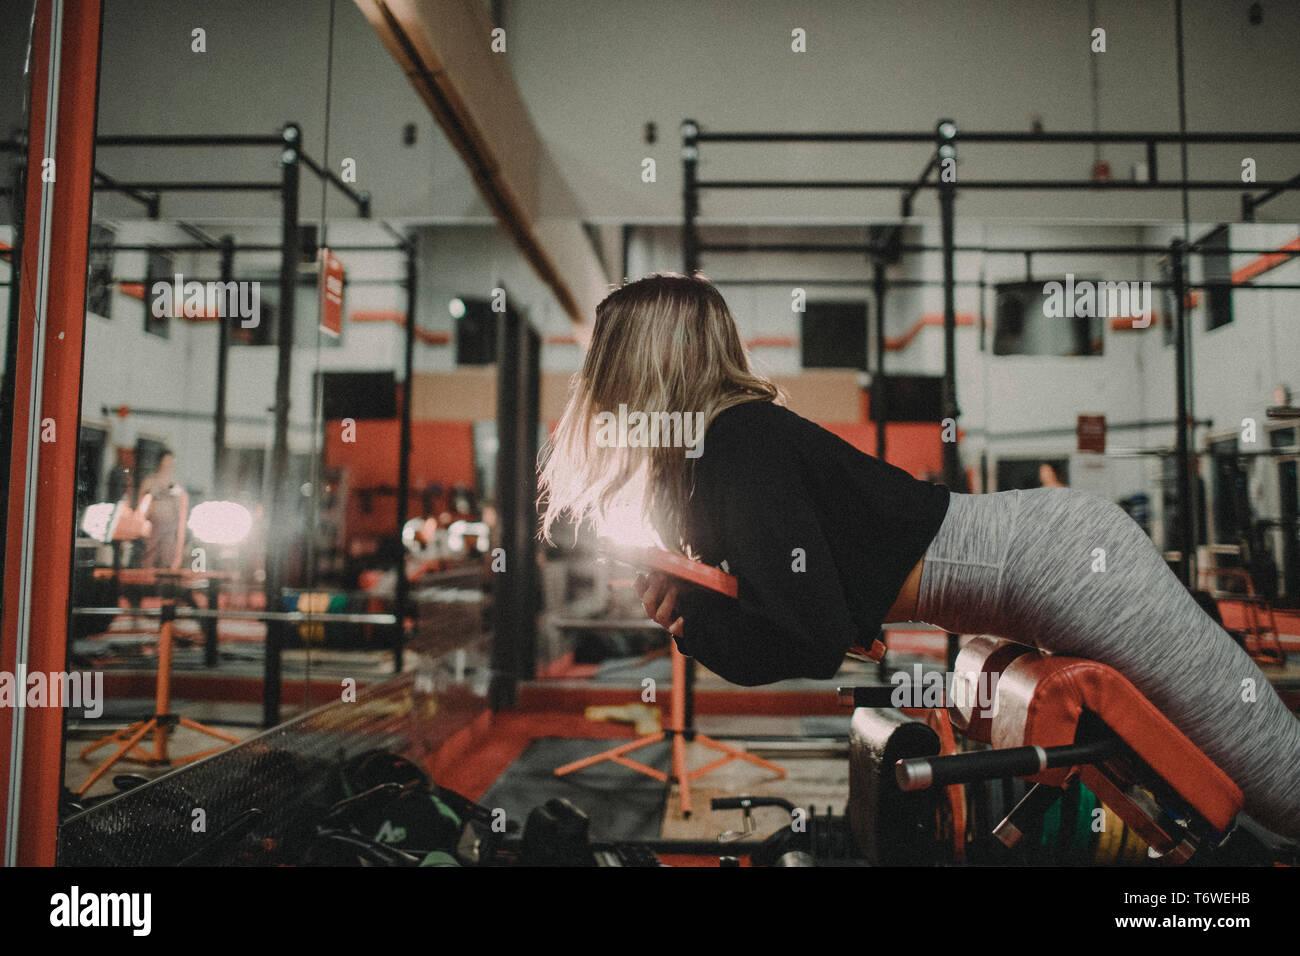 Donna attraente peso di sollevamento su Hyper Extension panca in palestra Foto Stock